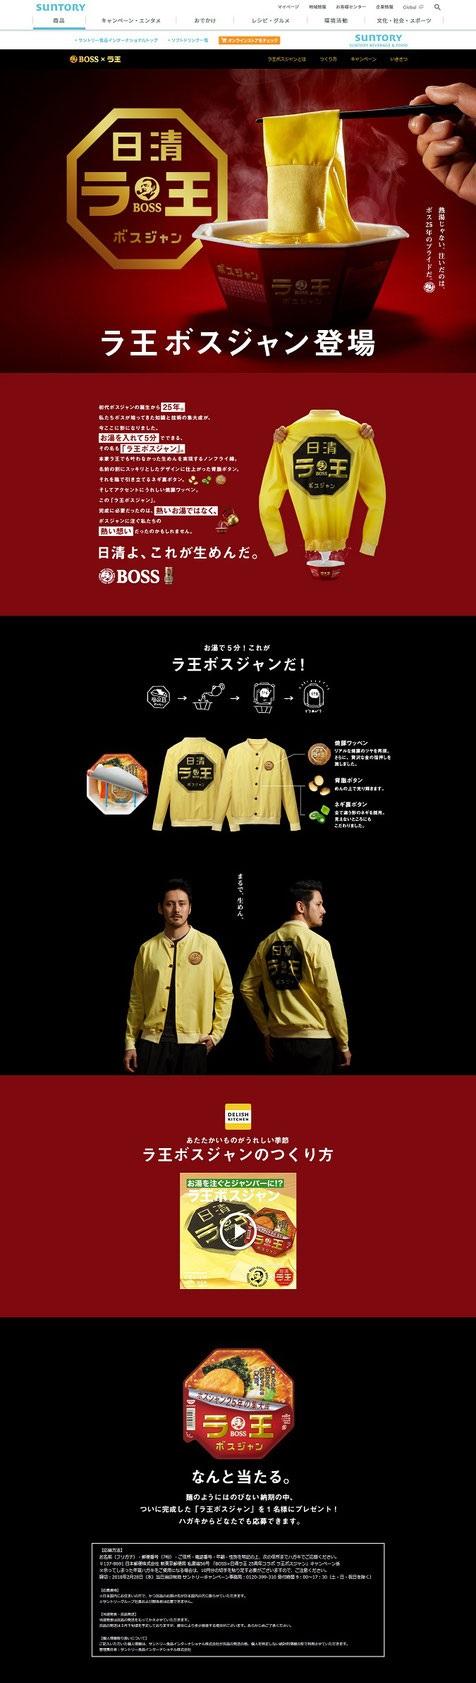 【BOSS】BOSS×日清ラ王 25周年コラボ ラ王ボスジャンキャンペーン